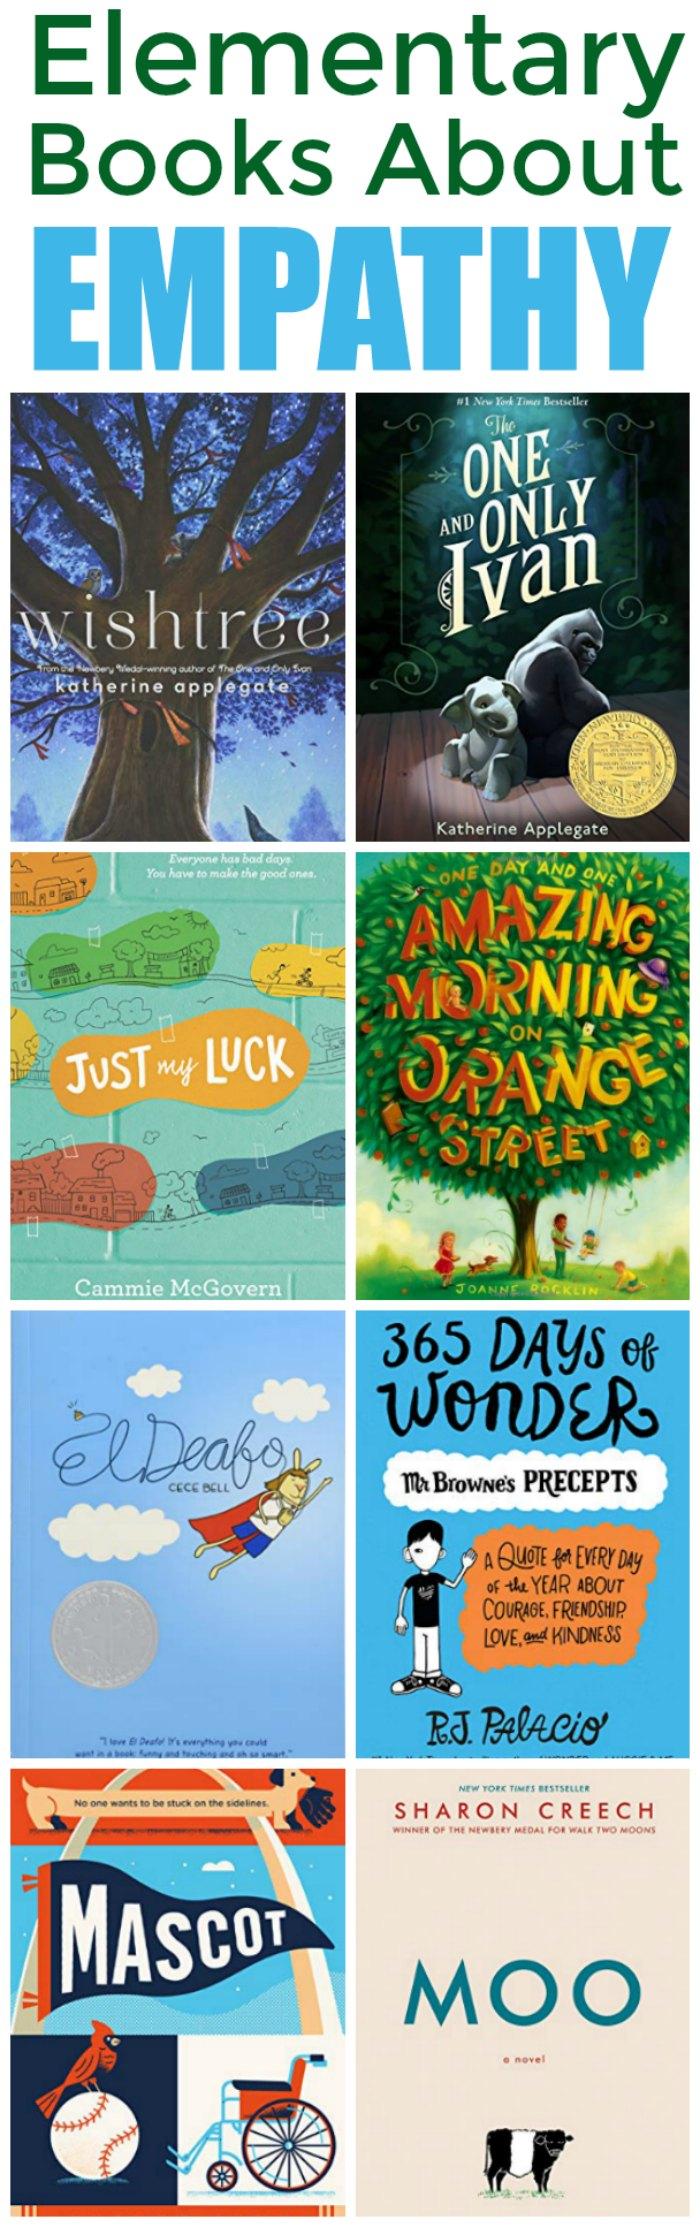 Elementary Books That Teach Empathy | Mommy Evolution